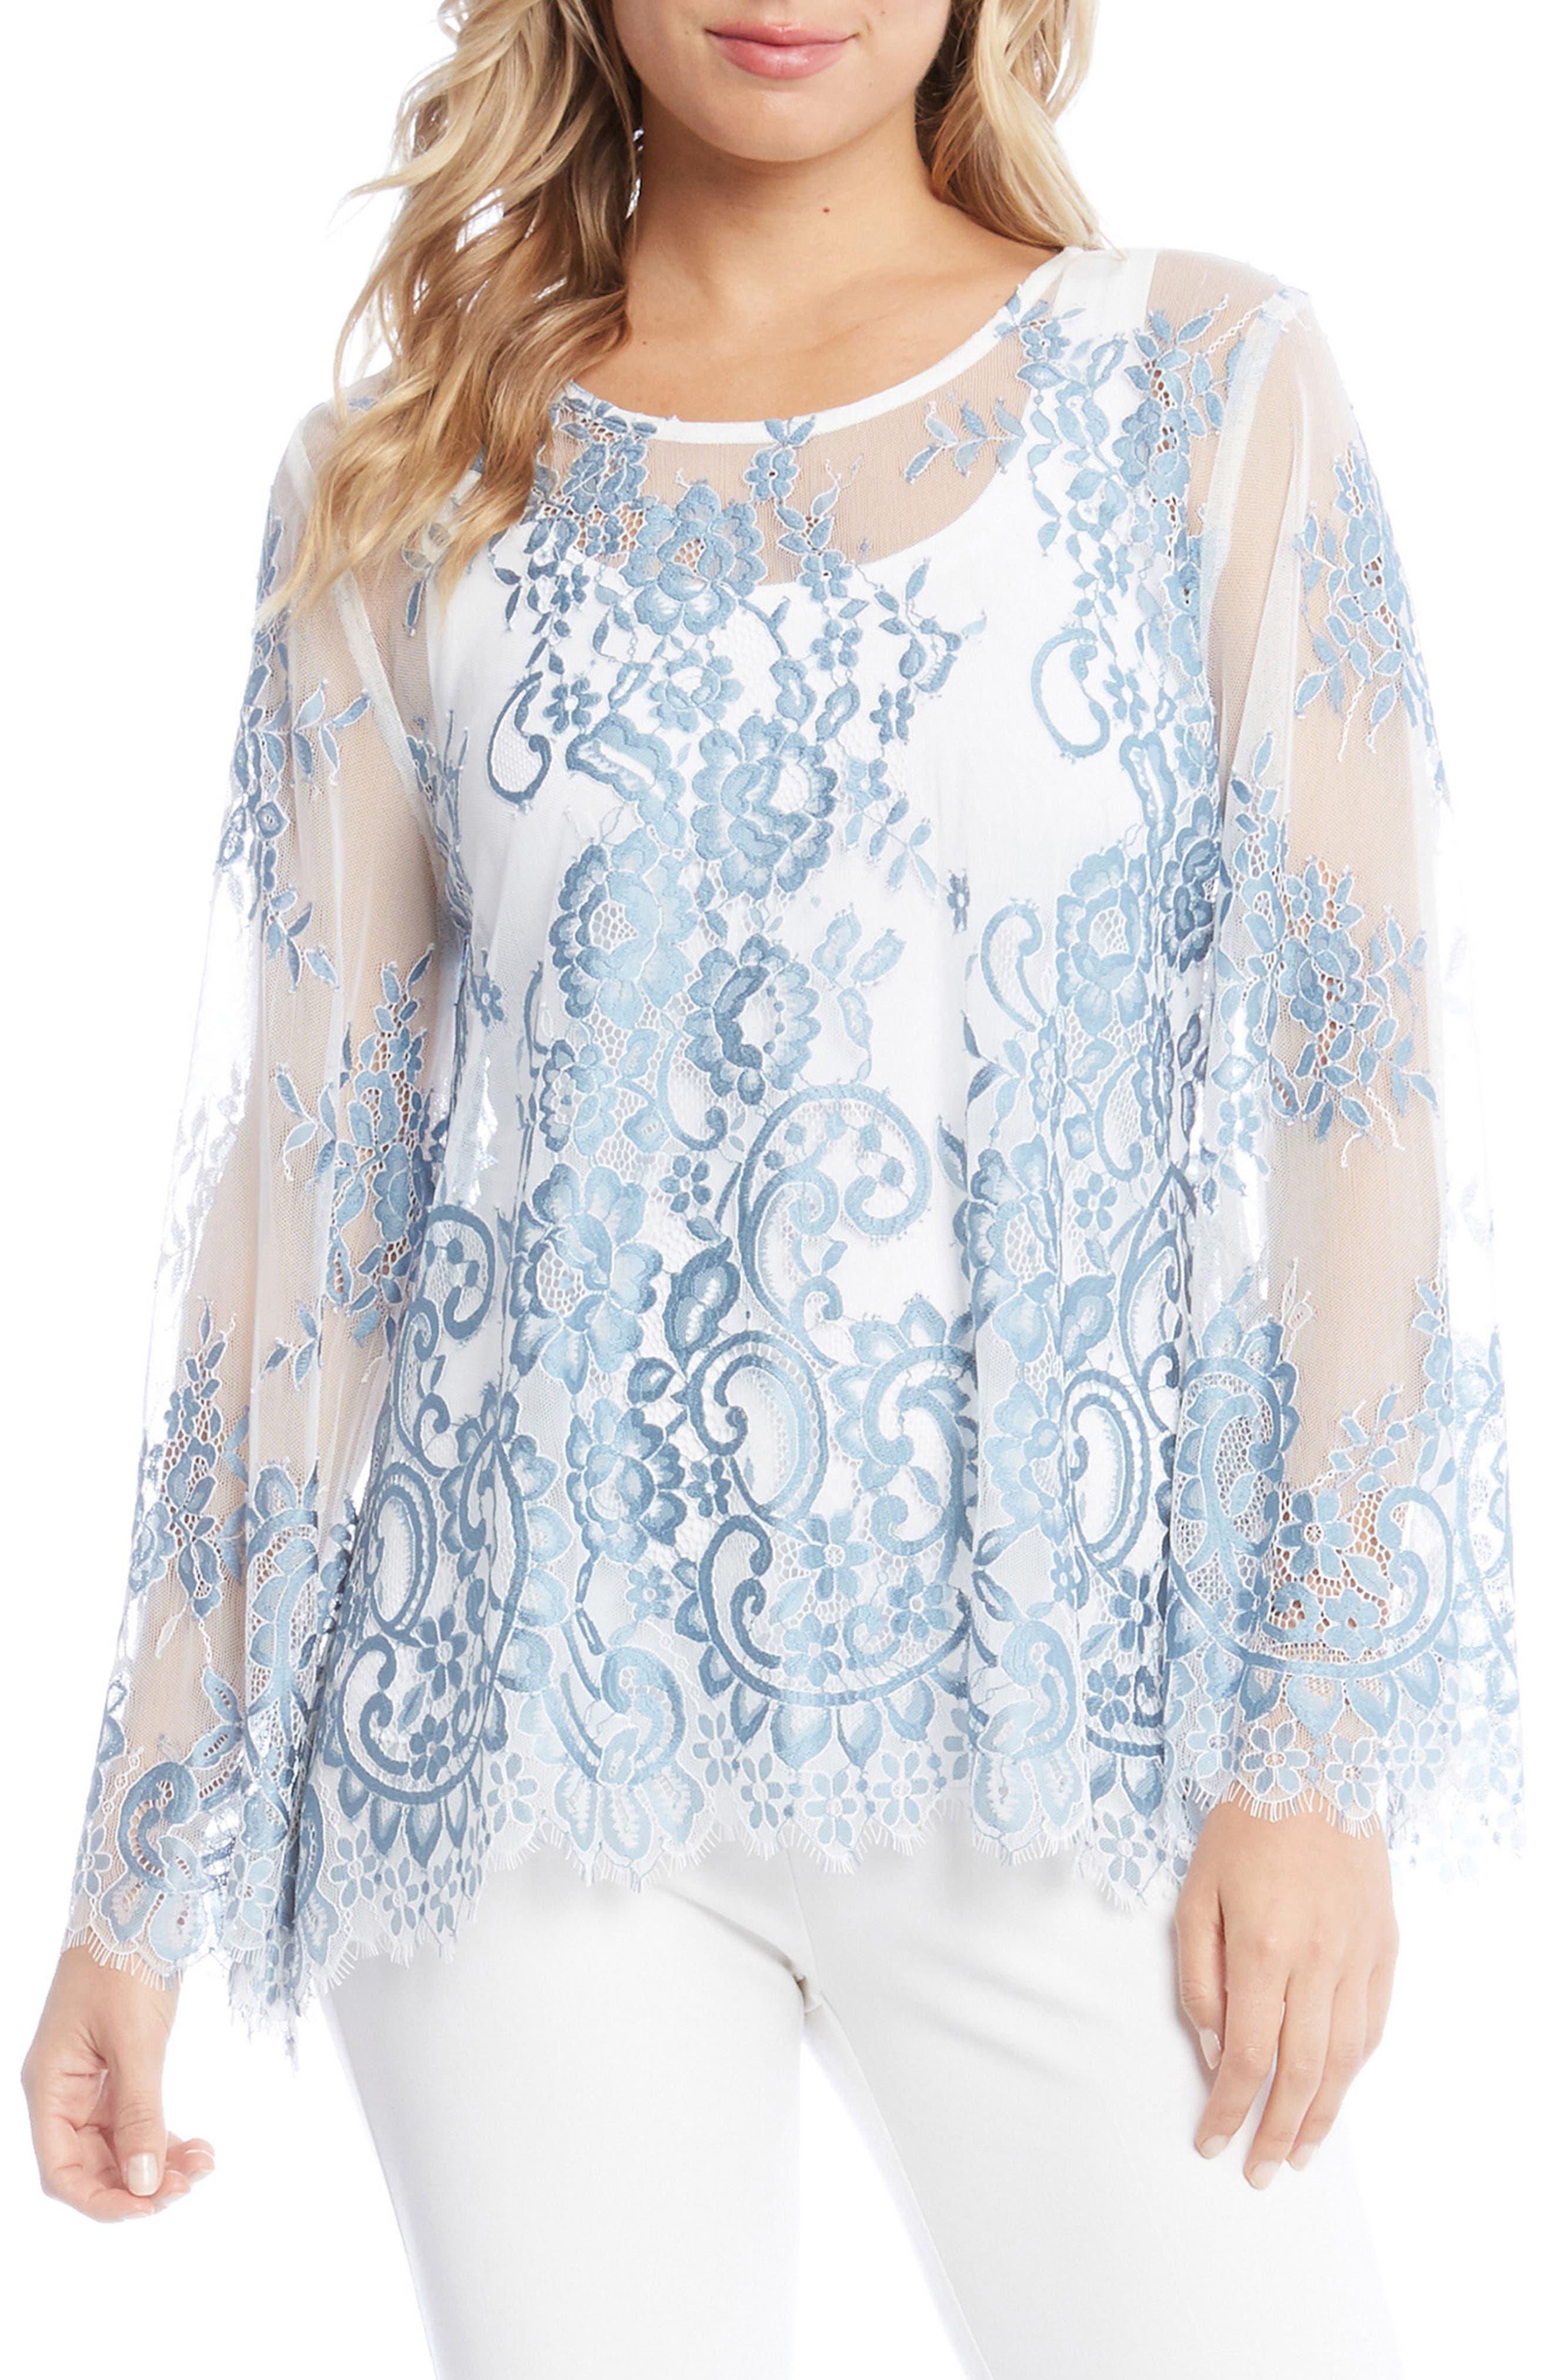 Main Image - Karen Kane Embroidered Floral Lace Top